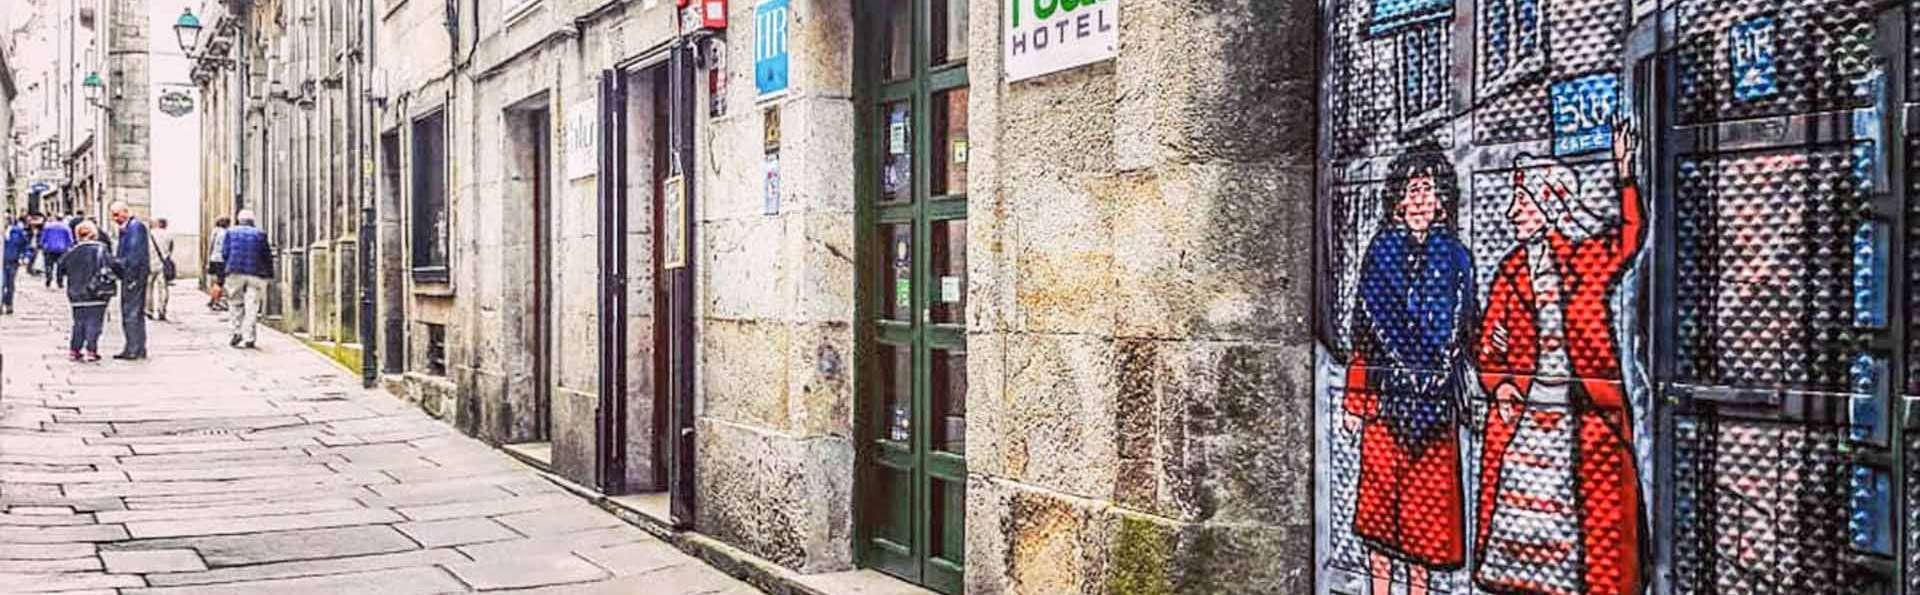 Hotel Real Santiago - EDIT_EXTERIOR_02.jpg